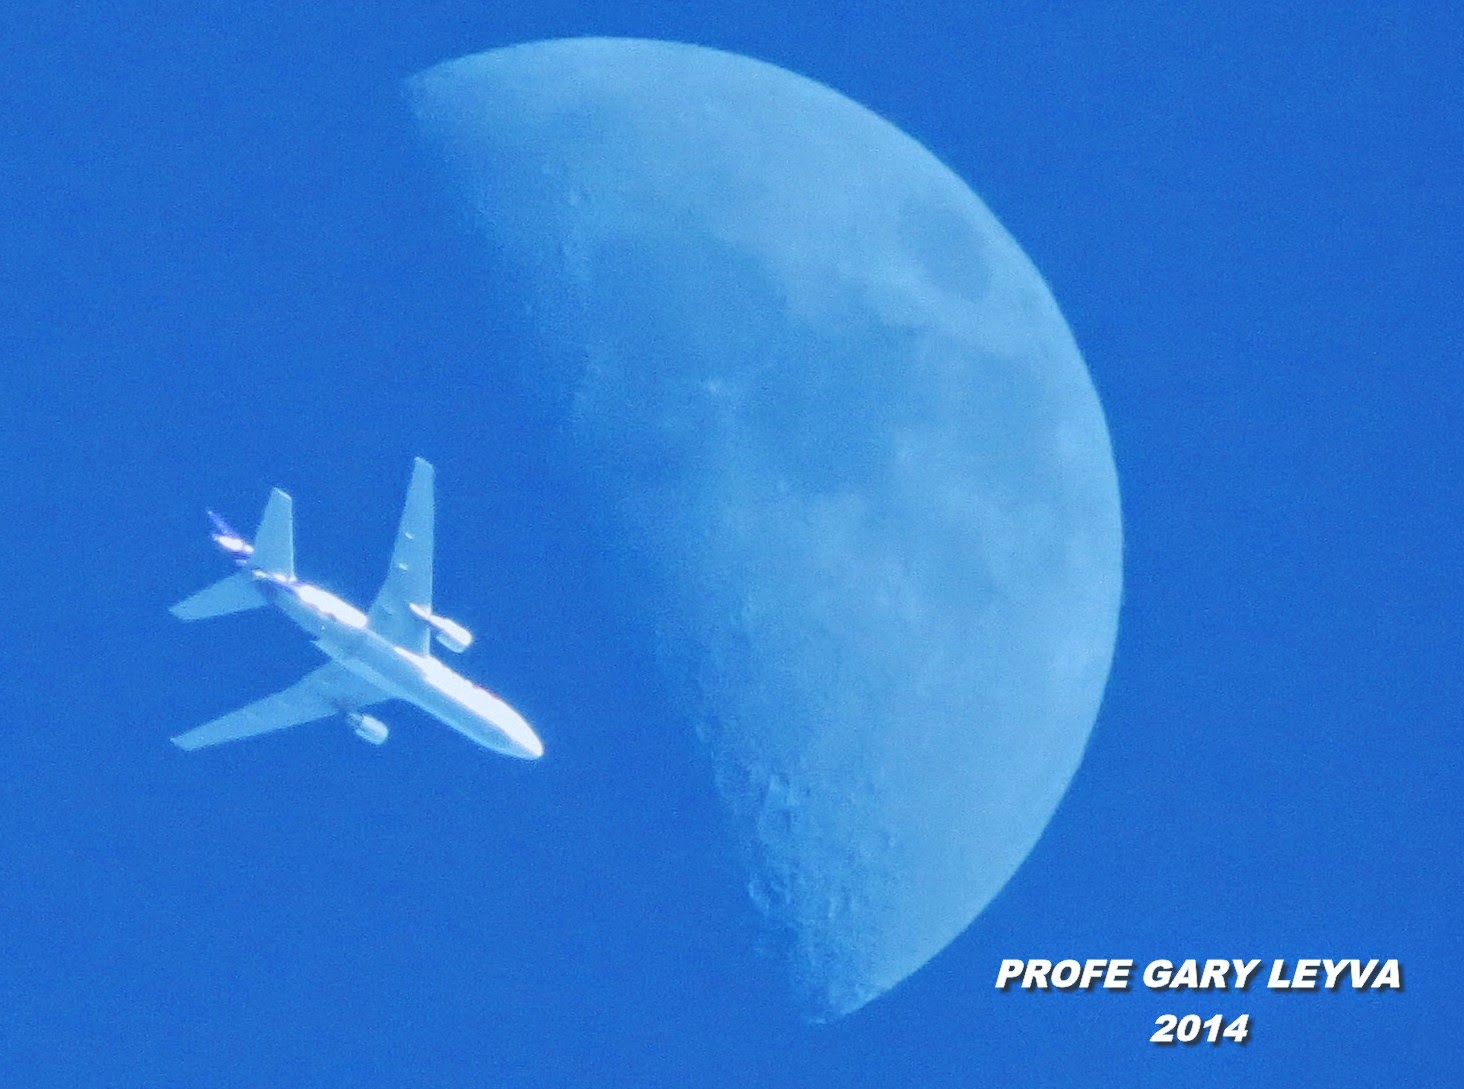 Moon, plane....